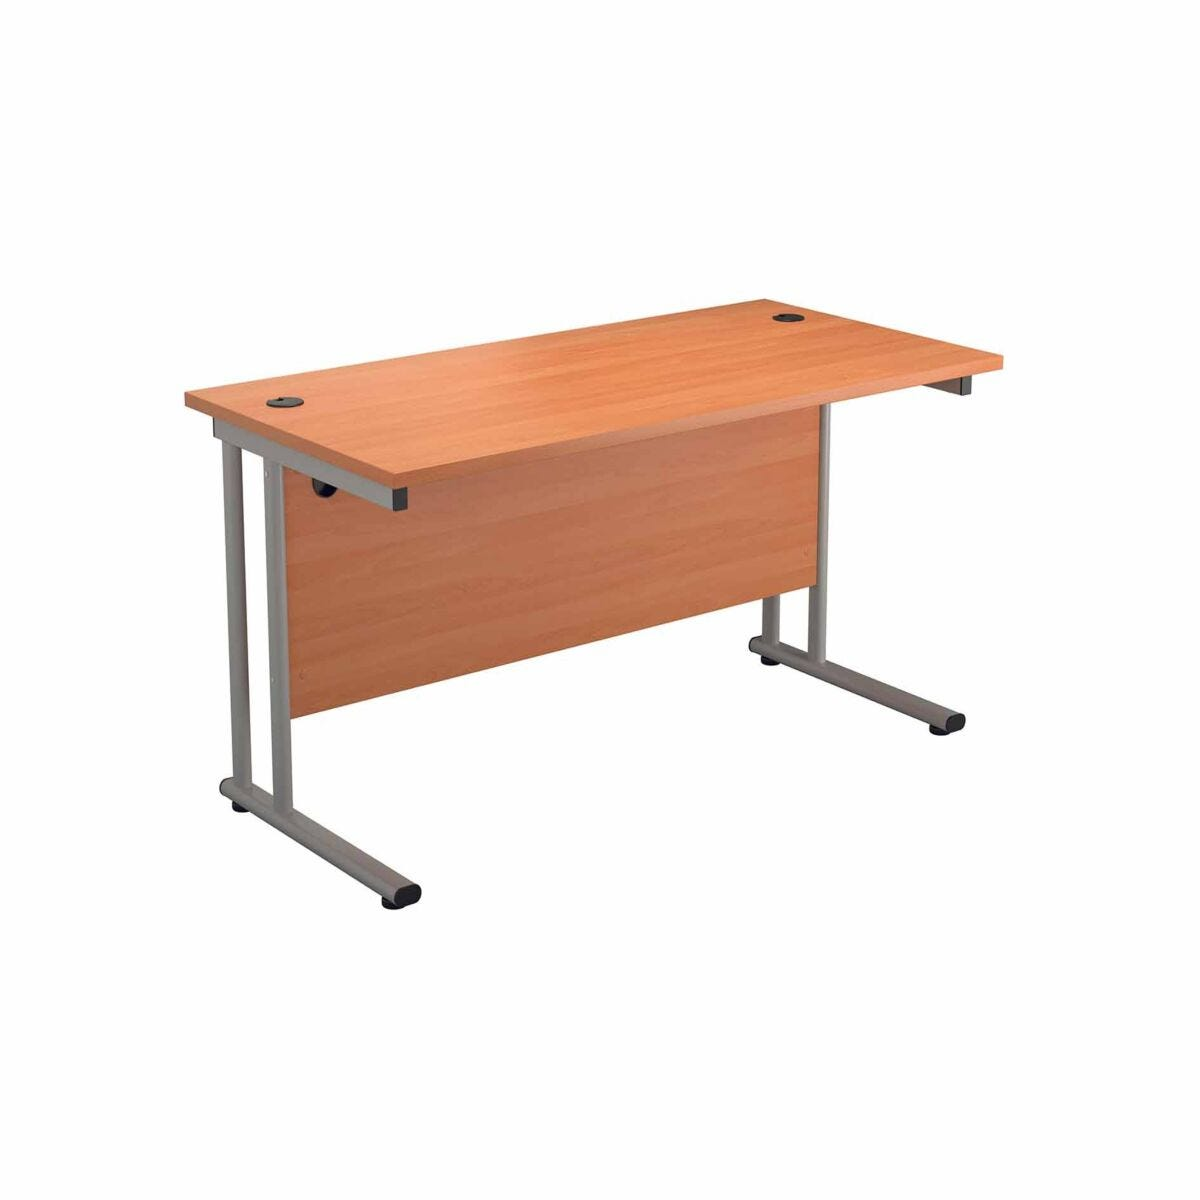 TC Office Start Silver Cantilever Frame Desk 1600x800mm